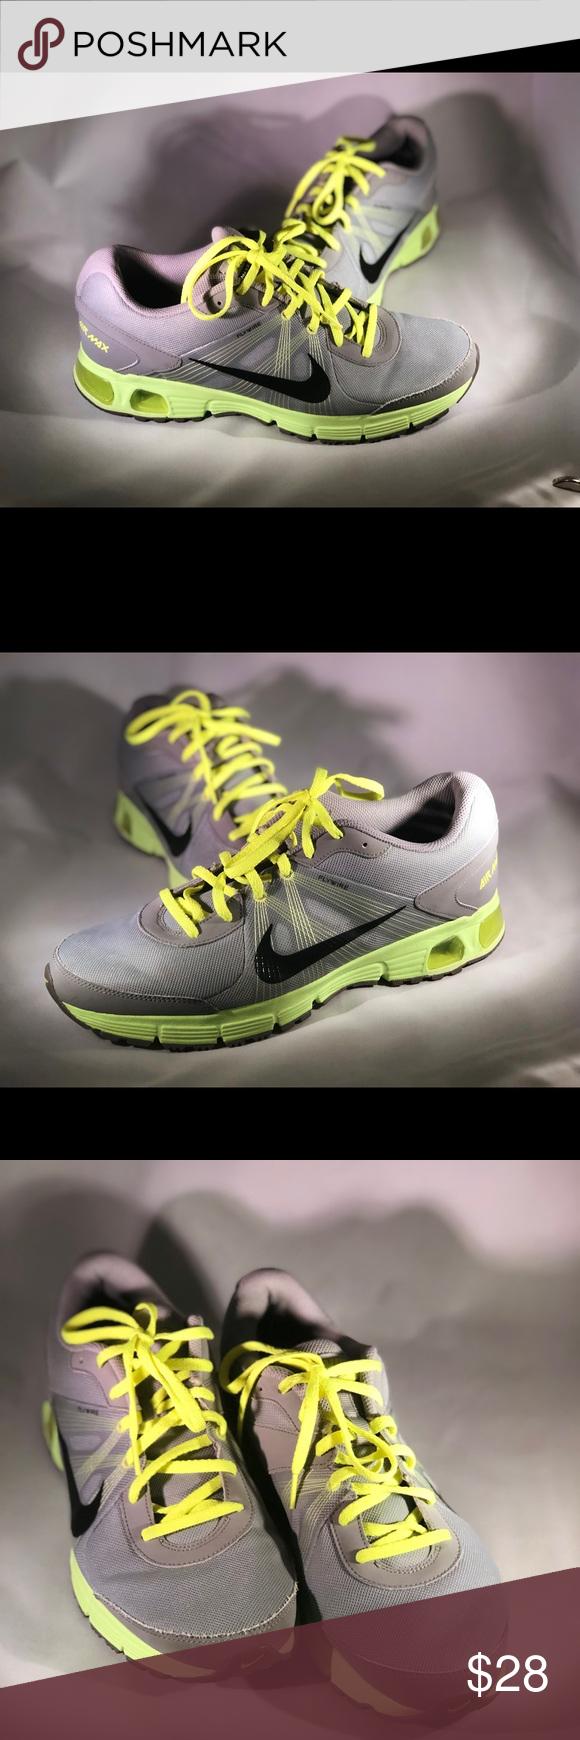 new product 51619 cbb03 Nike Max Air Mens Running Shoes size 11 USED Used Nike Air Max Running Shoes .